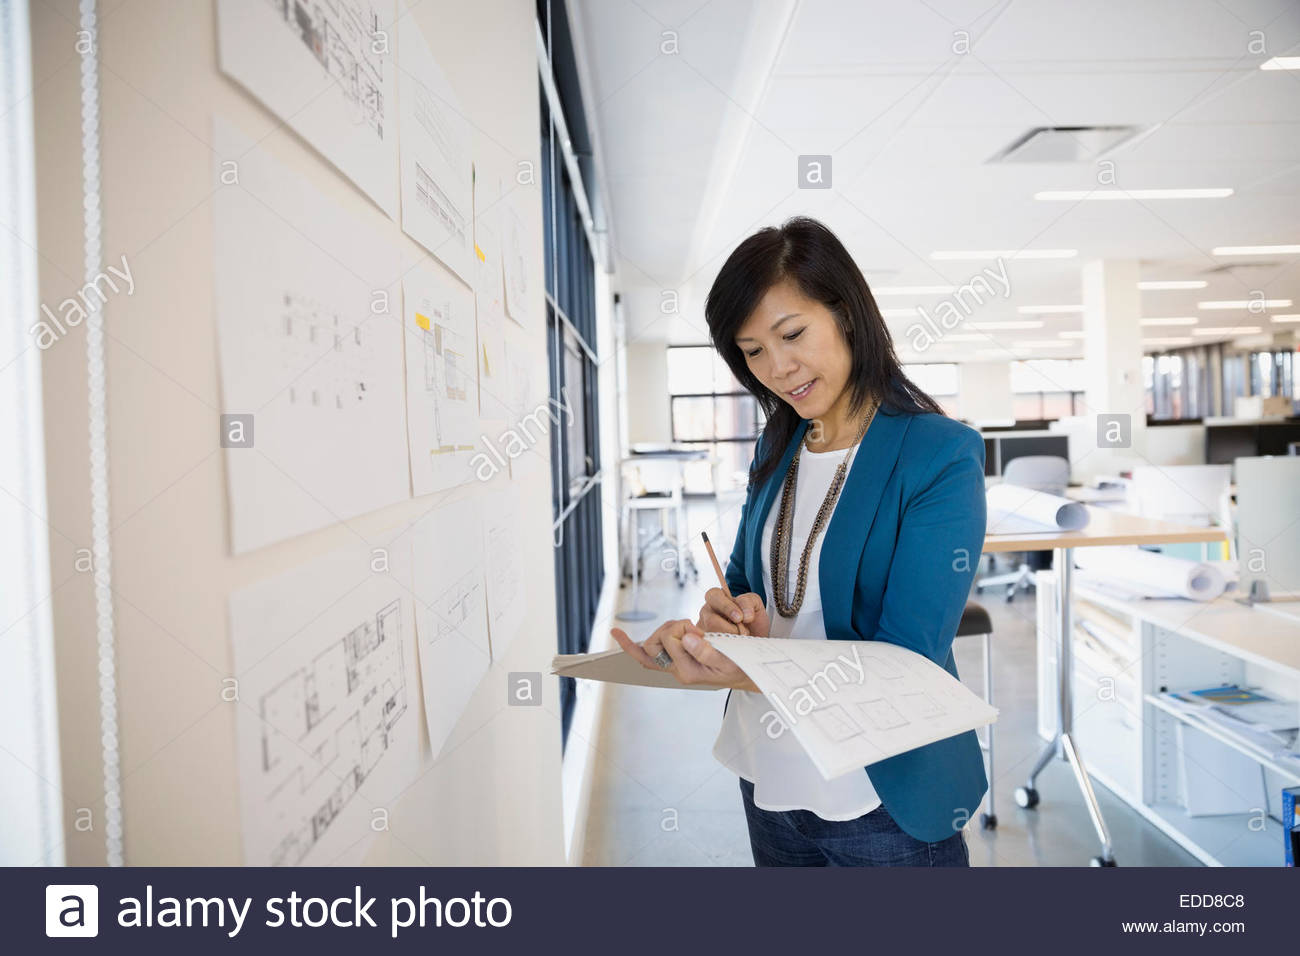 Architect drafting plans at wall - Stock Image